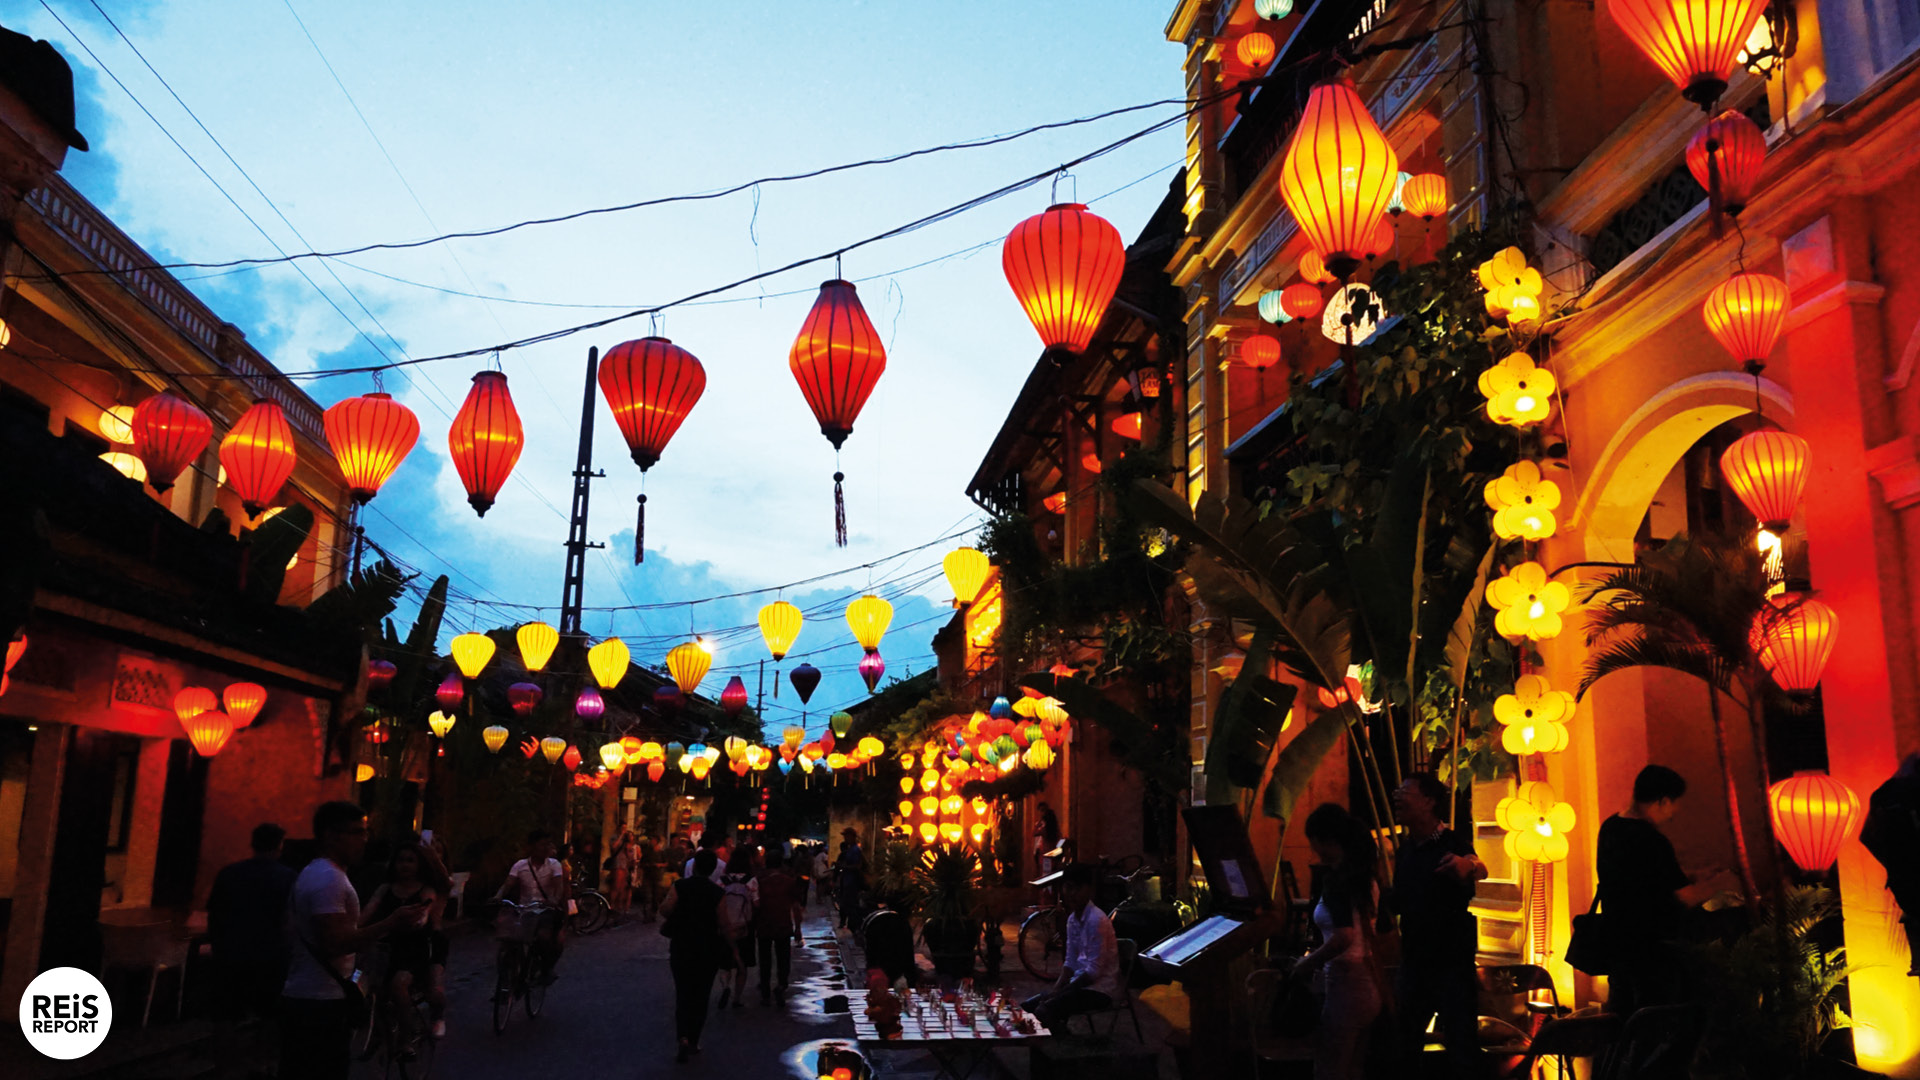 hoi an vietnam bezienswaardigheden